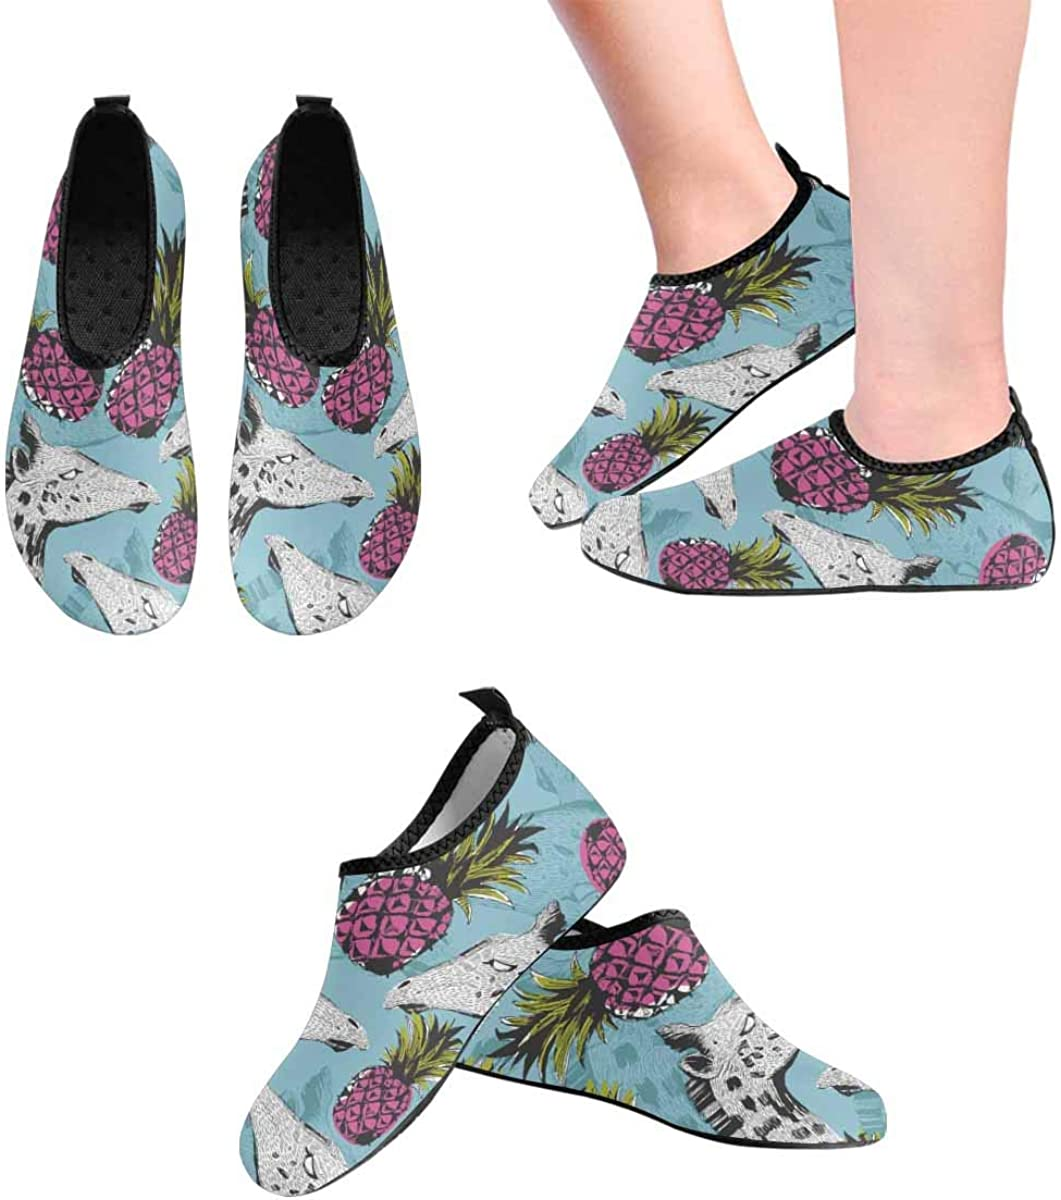 INTERESTPRINT Mens Water Shoes Giraffe Pineapple Beach Swim Shoes Quick Dry Aqua Socks Pool Shoes